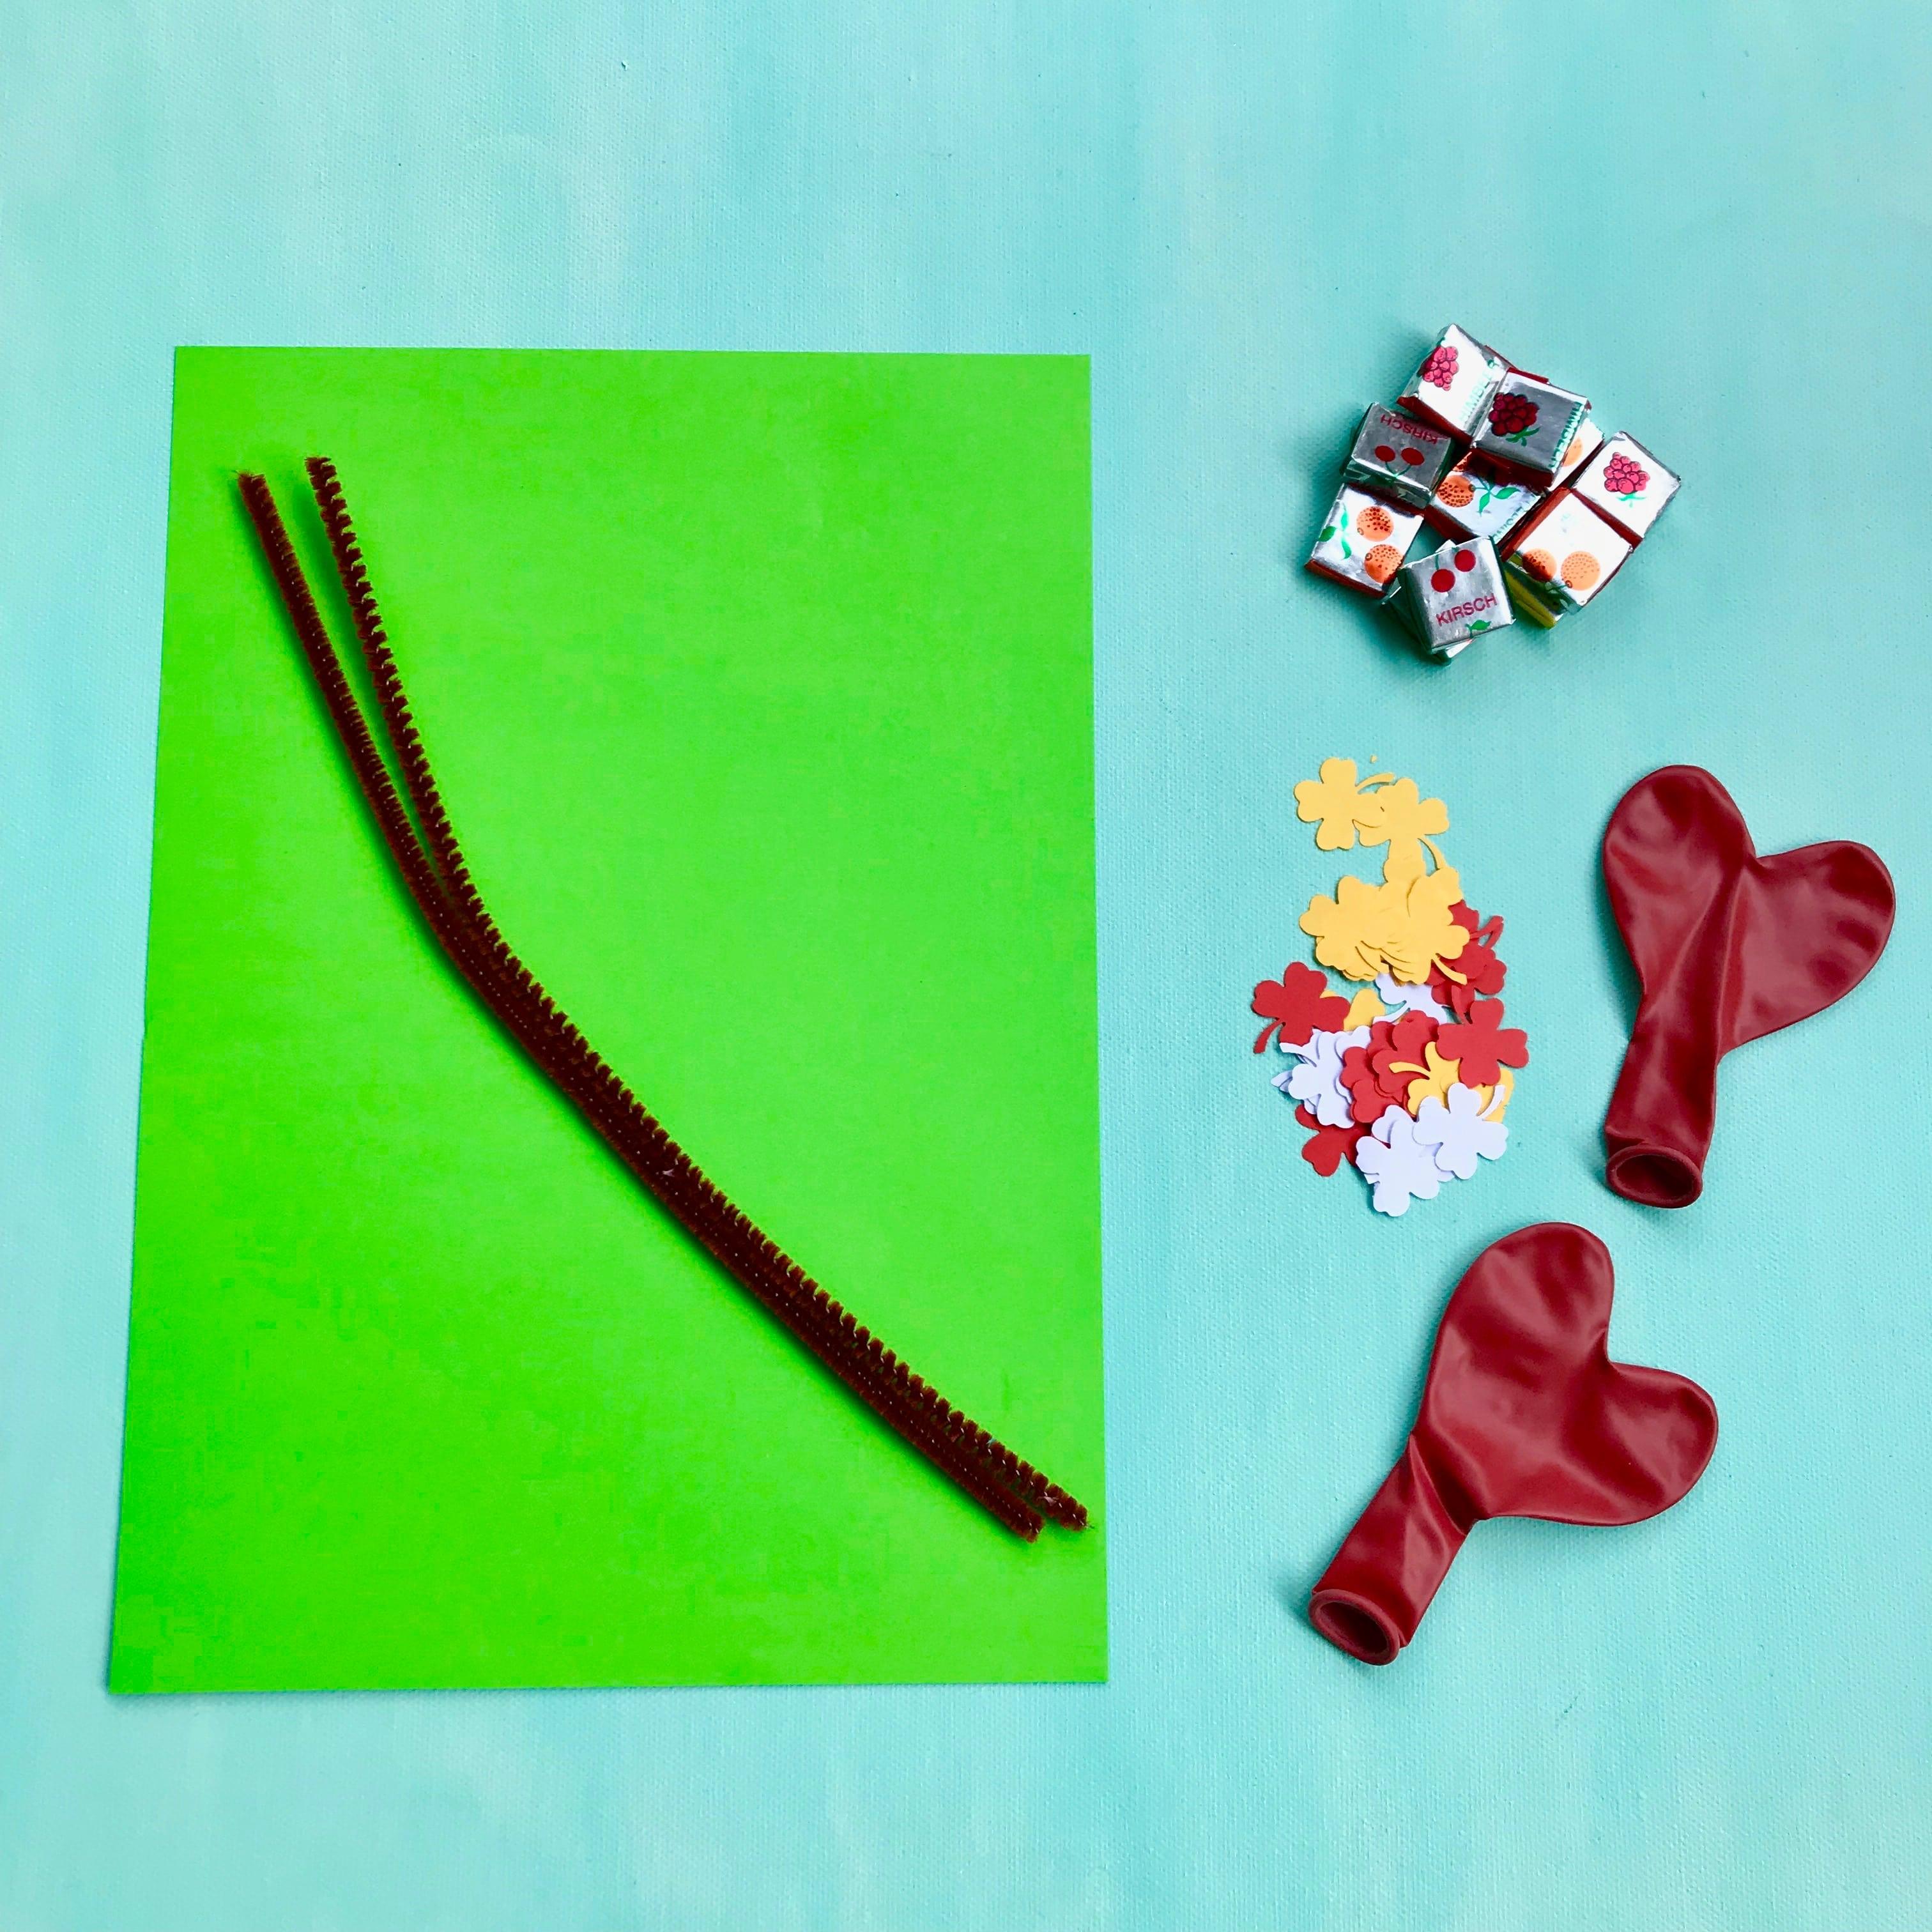 DIY Partydekoration, Lufballons, Kirschen, Material